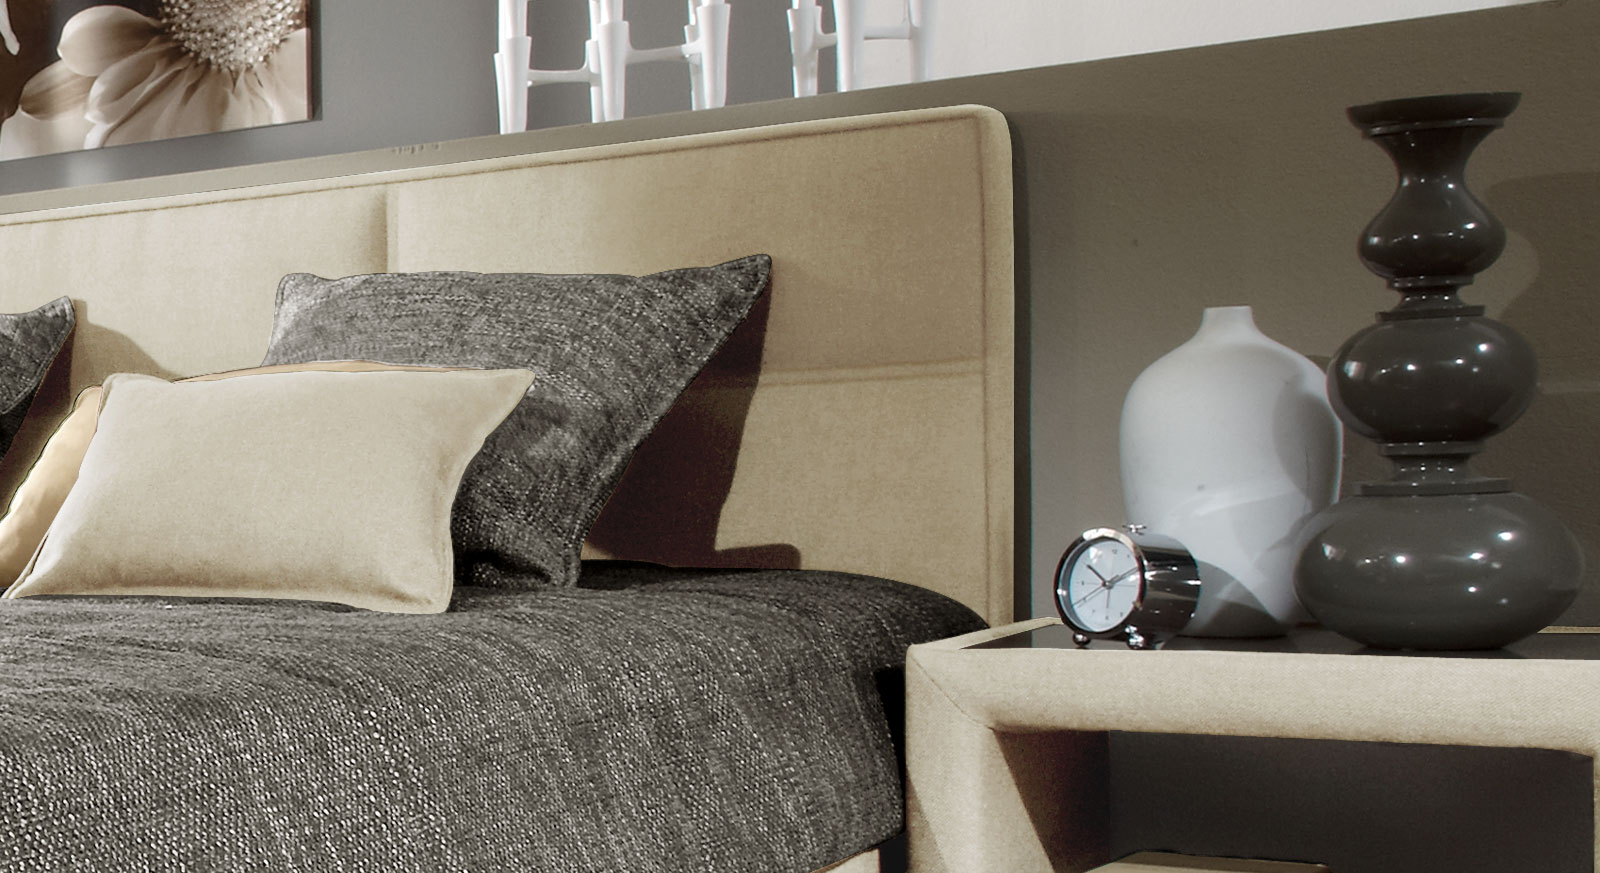 polsterbett inklusive matratze und lattenrost quintino. Black Bedroom Furniture Sets. Home Design Ideas